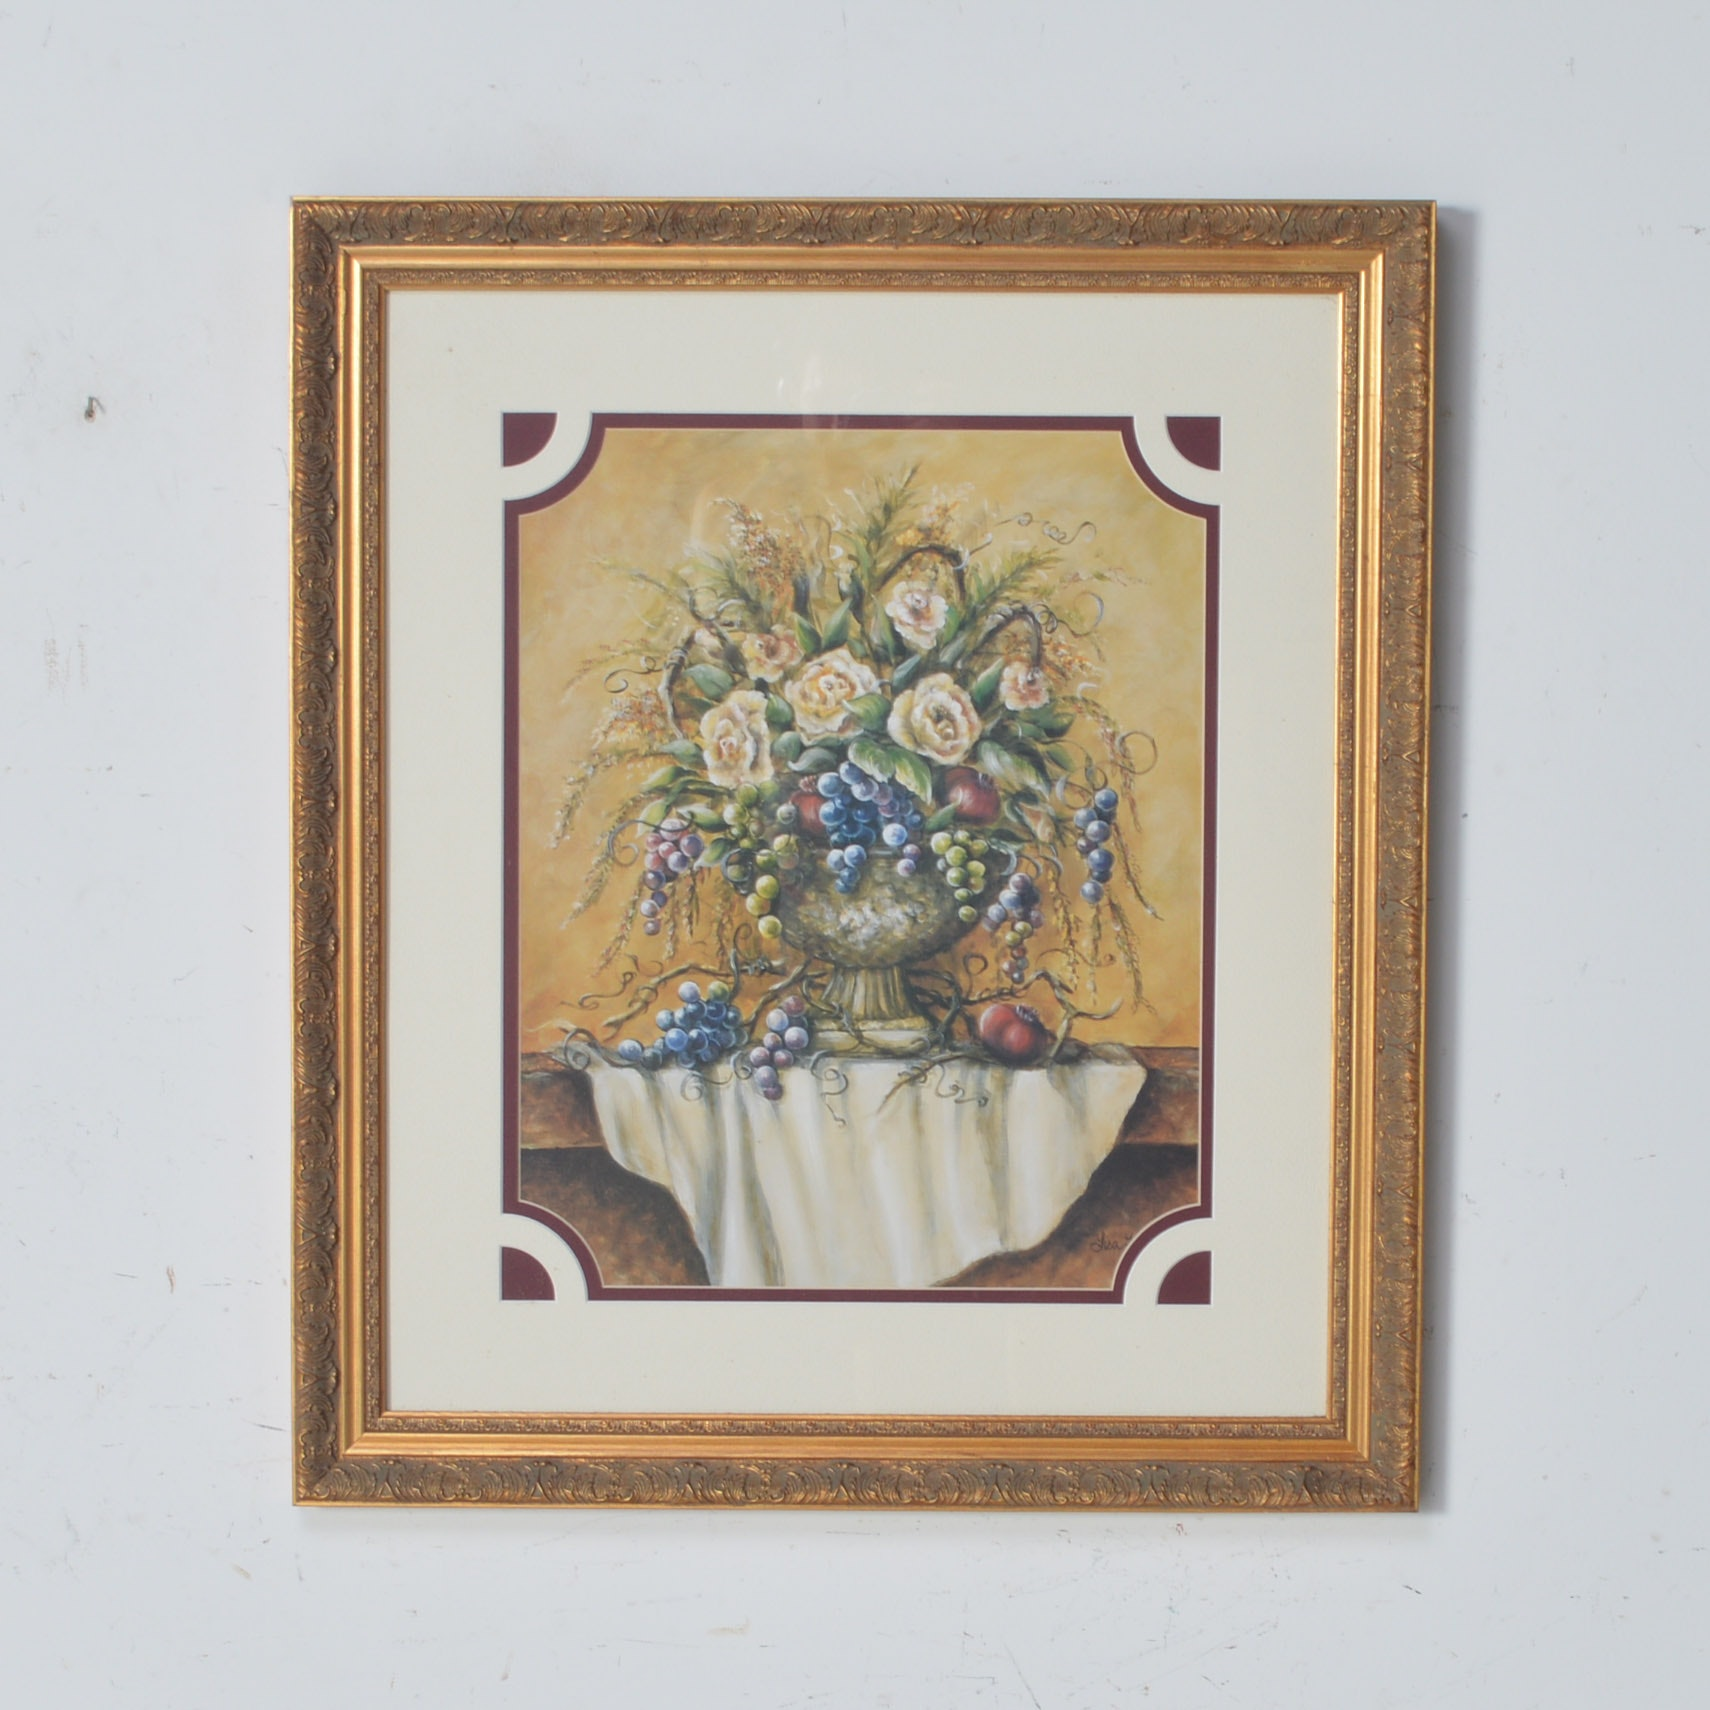 Framed Offset Lithograph of a Floral Still Life